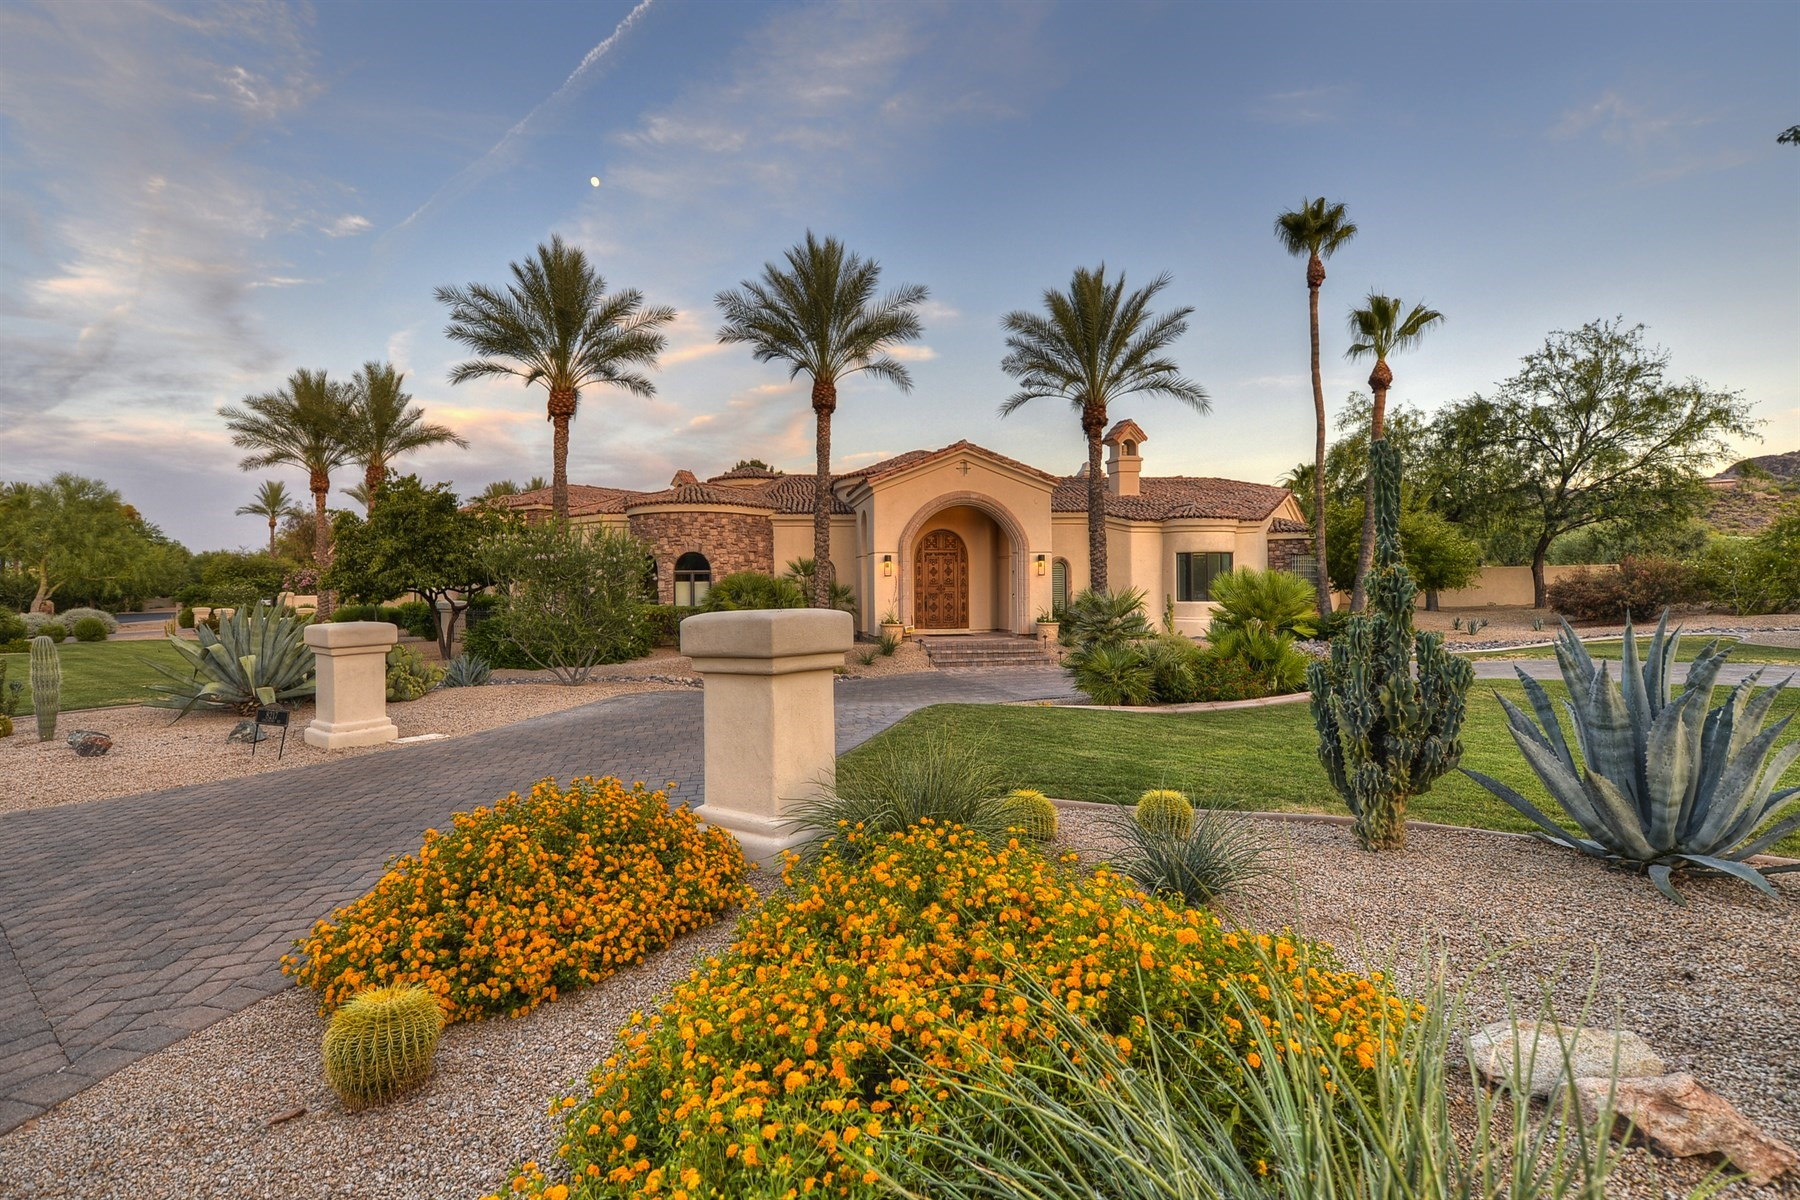 独户住宅 为 销售 在 Newly updated Paradise Valley home 8217 N Coconino Rd, 天堂谷, 亚利桑那州, 85253 美国